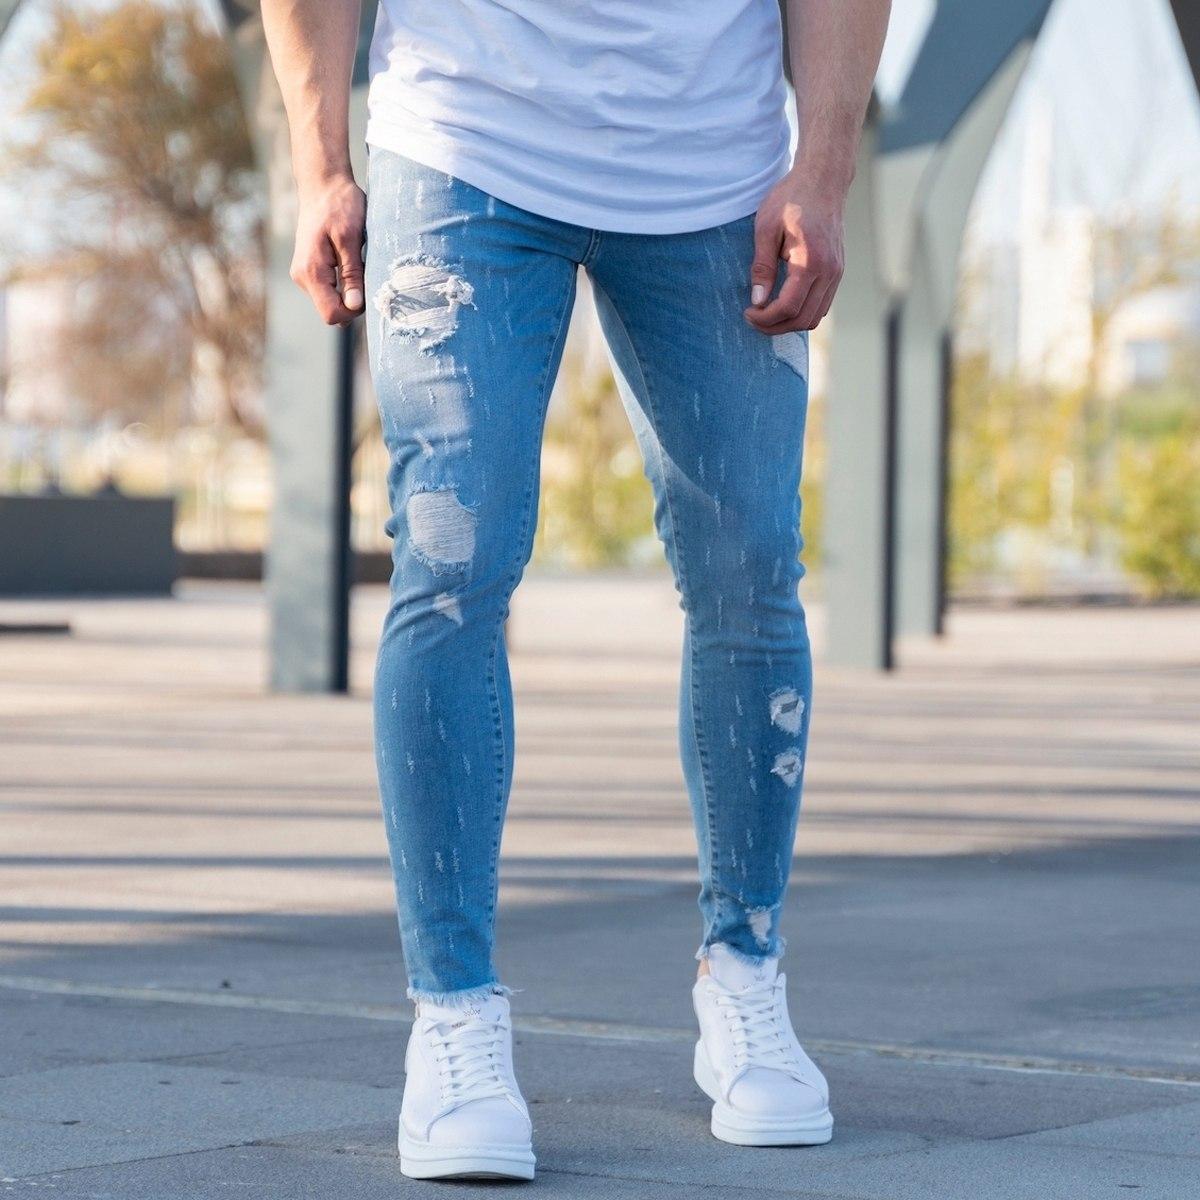 Men's Ragged Jeans In Ice Blue